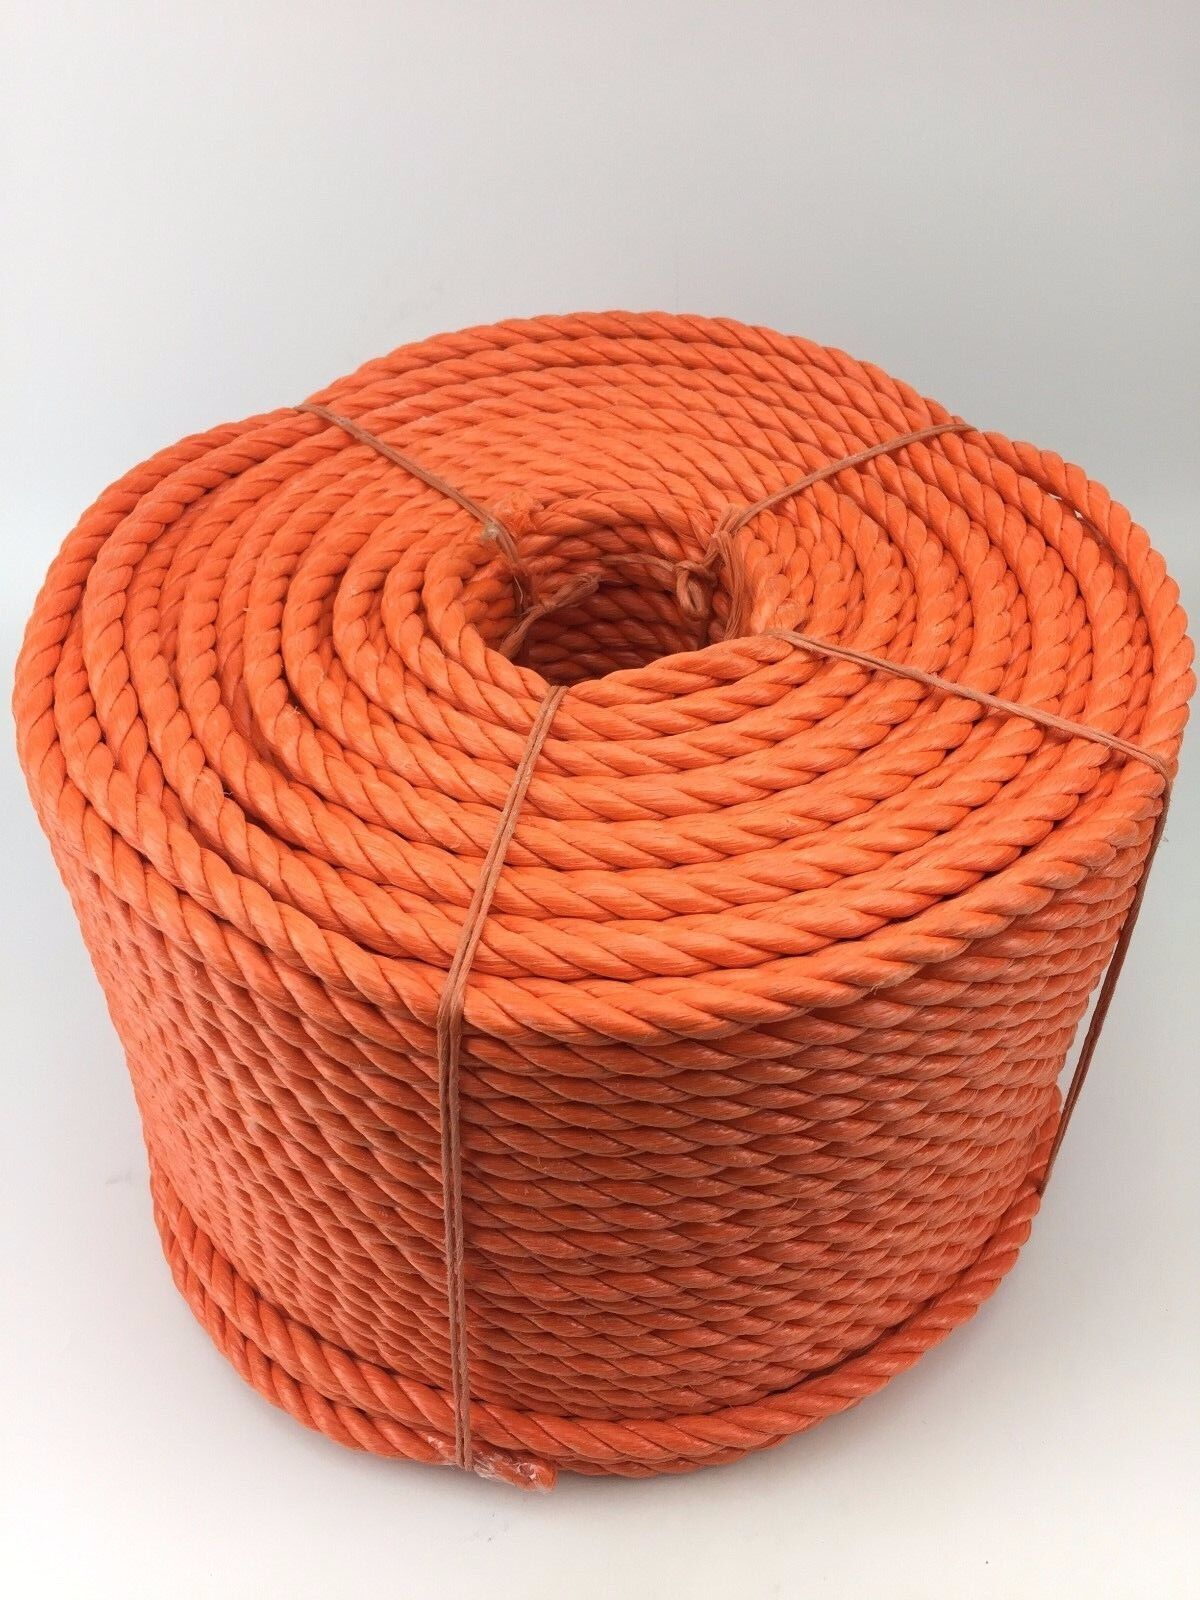 10mm orange Polypropylene Rope x 220m Coil, orange Poly Rope Coils, Polyrope